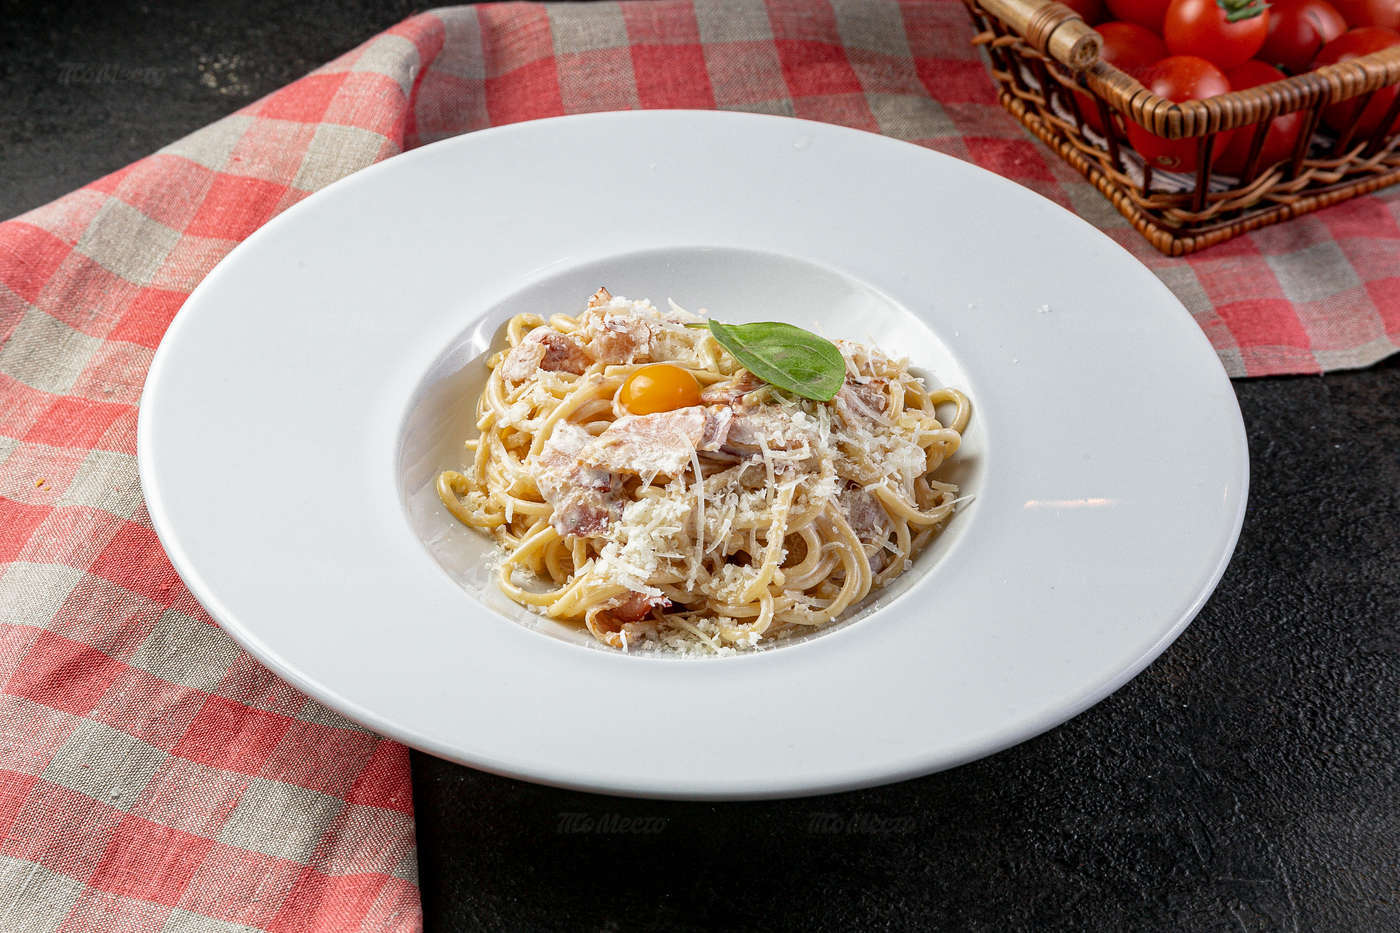 Меню ресторана Папа Пицциано (Papa Pizziano) на Новочеркасском проспекте фото 31